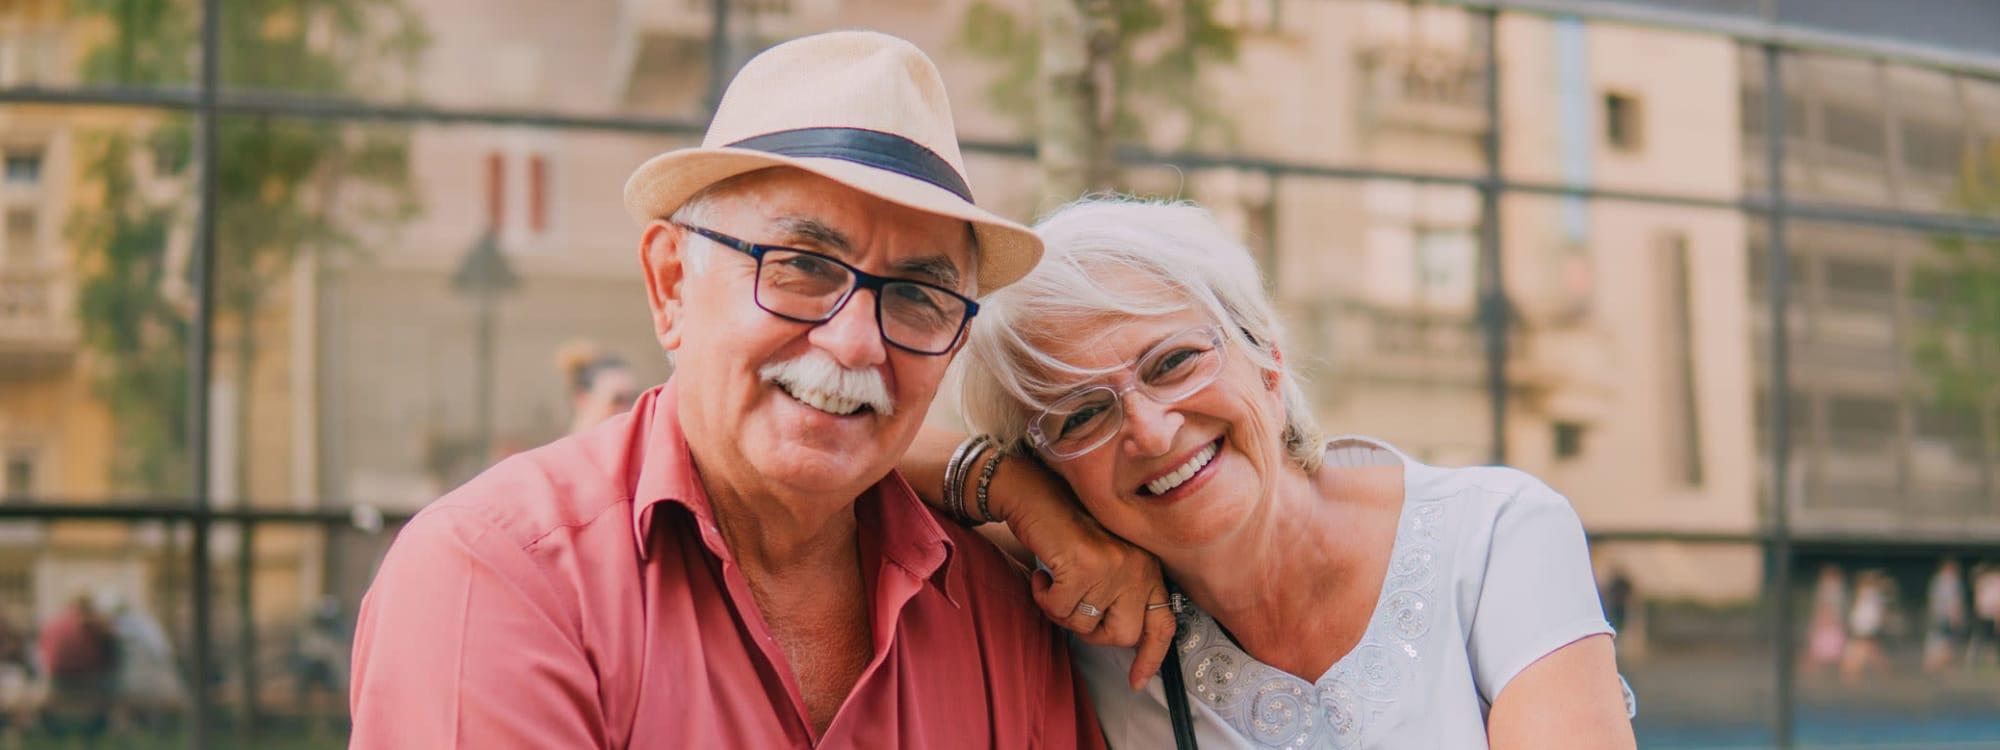 Programs & Services at Ebenezer Senior Living